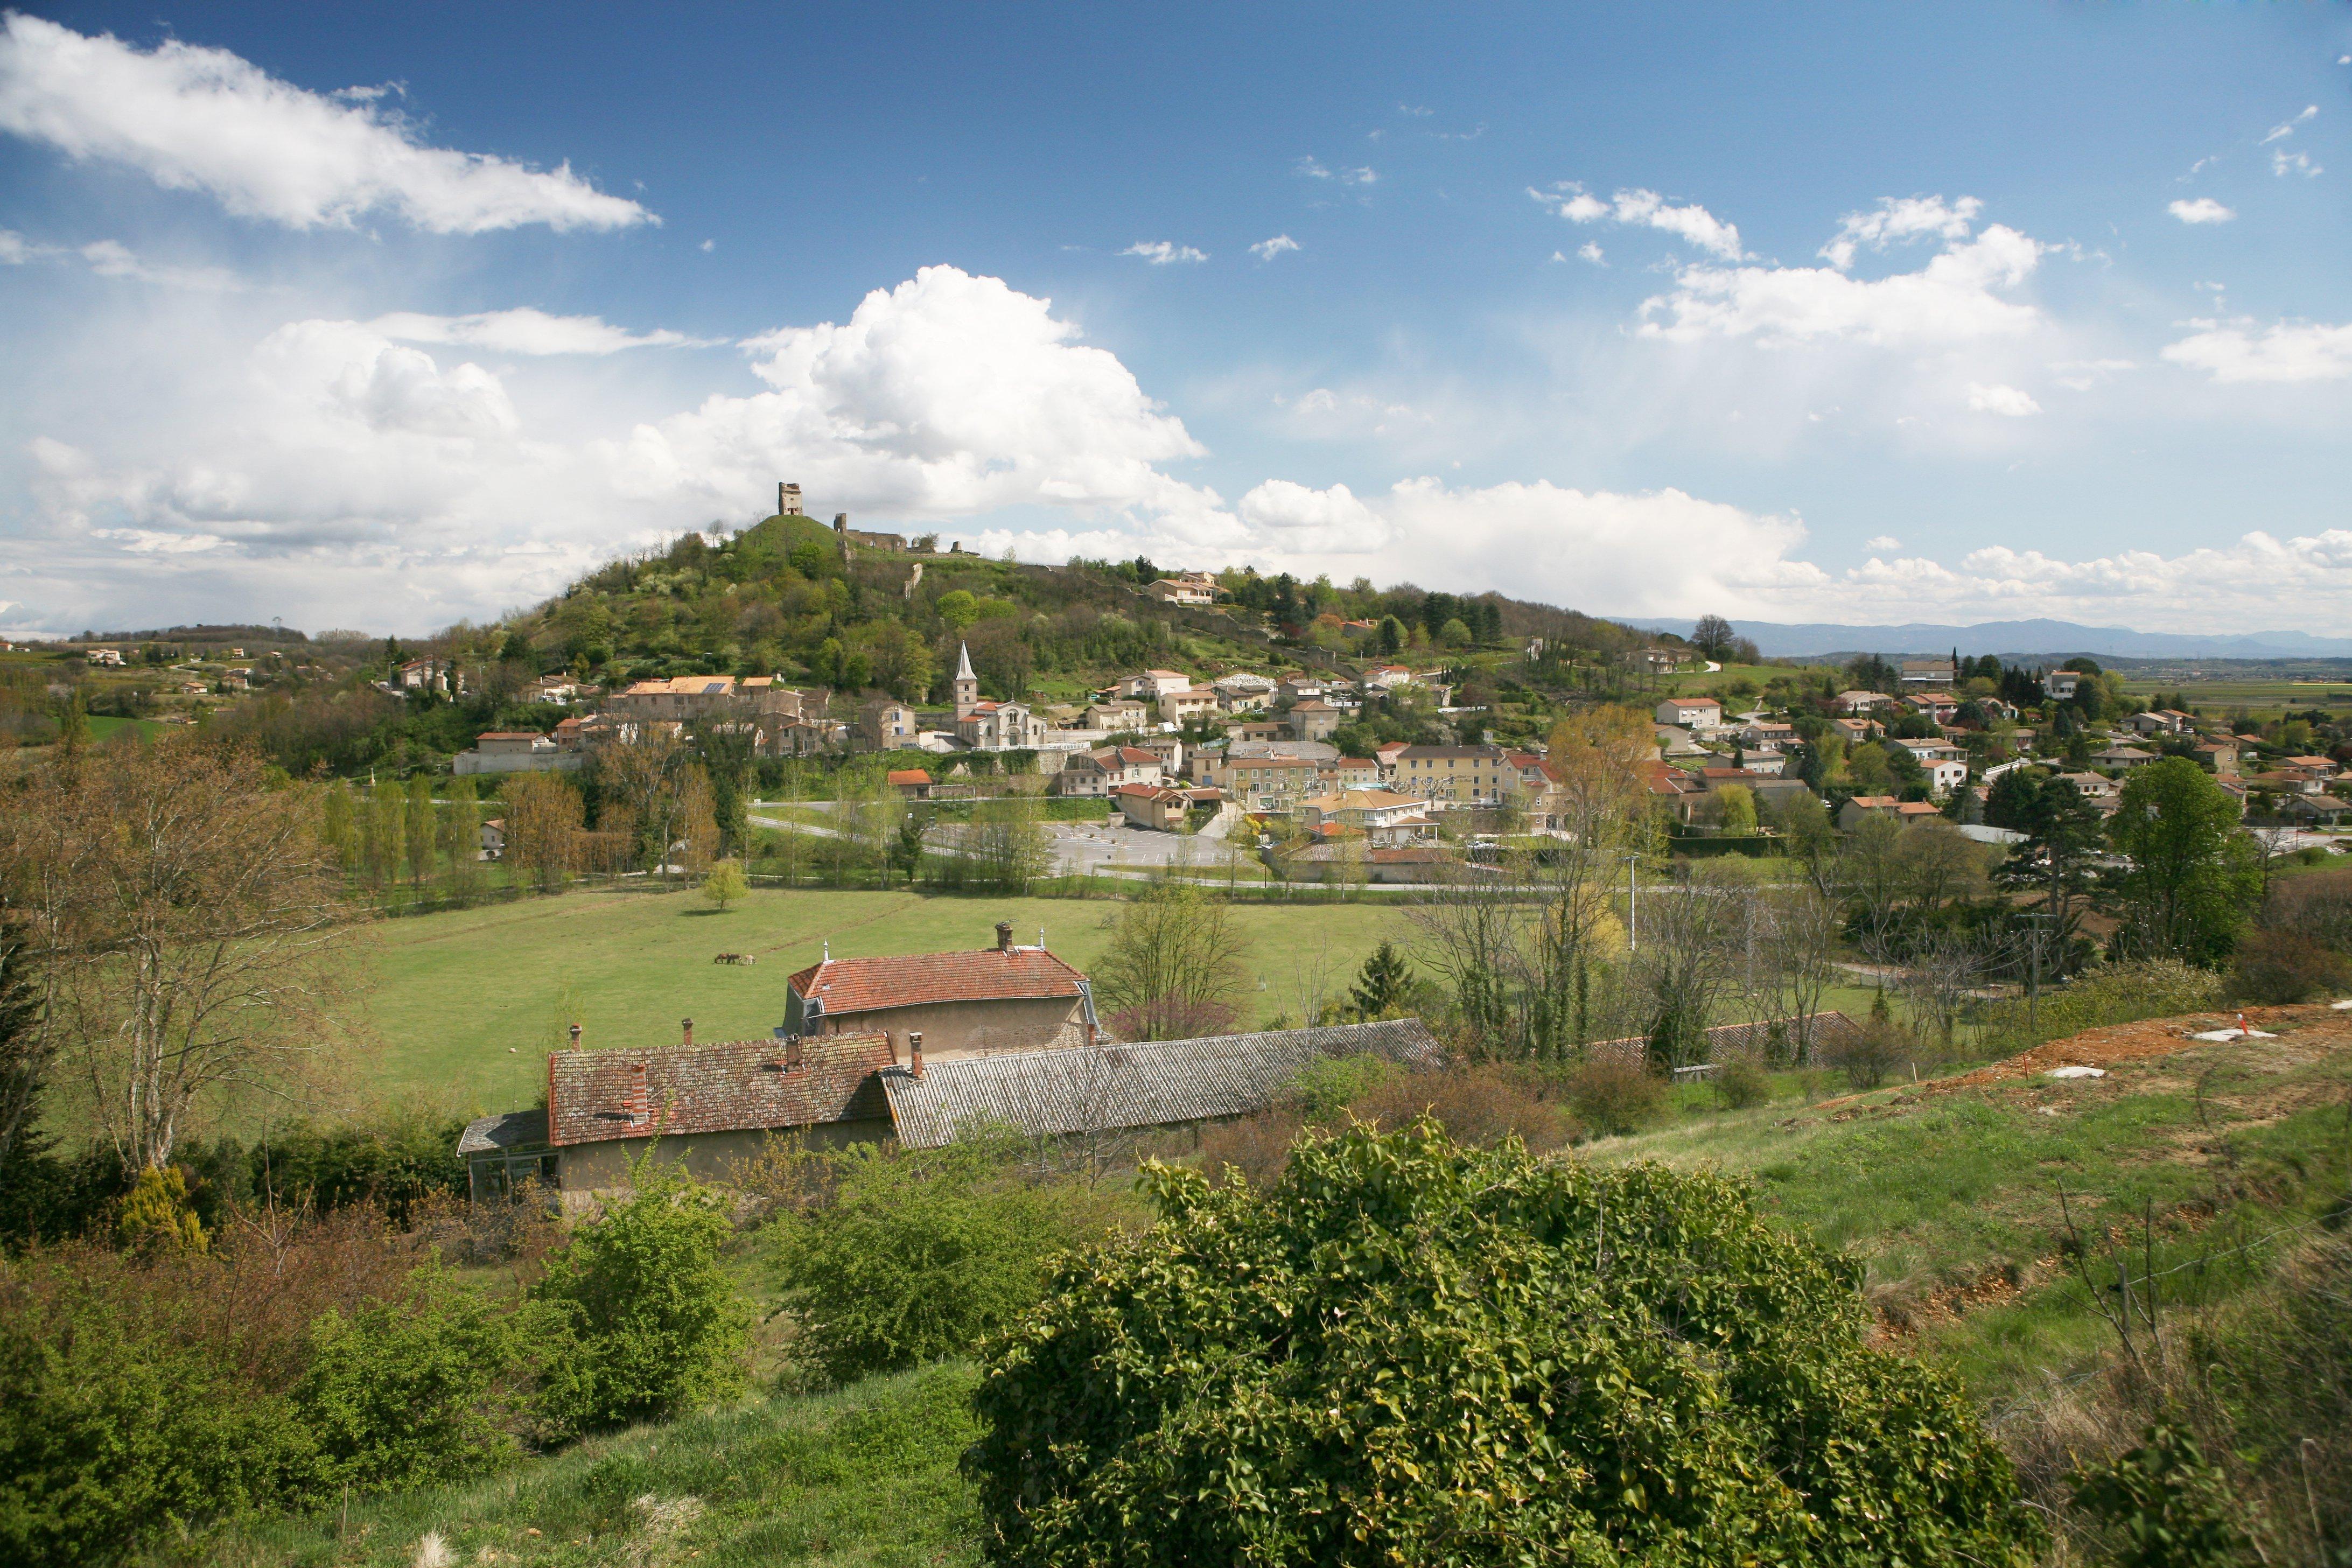 Image de la commune de Mercurol-Veaunes